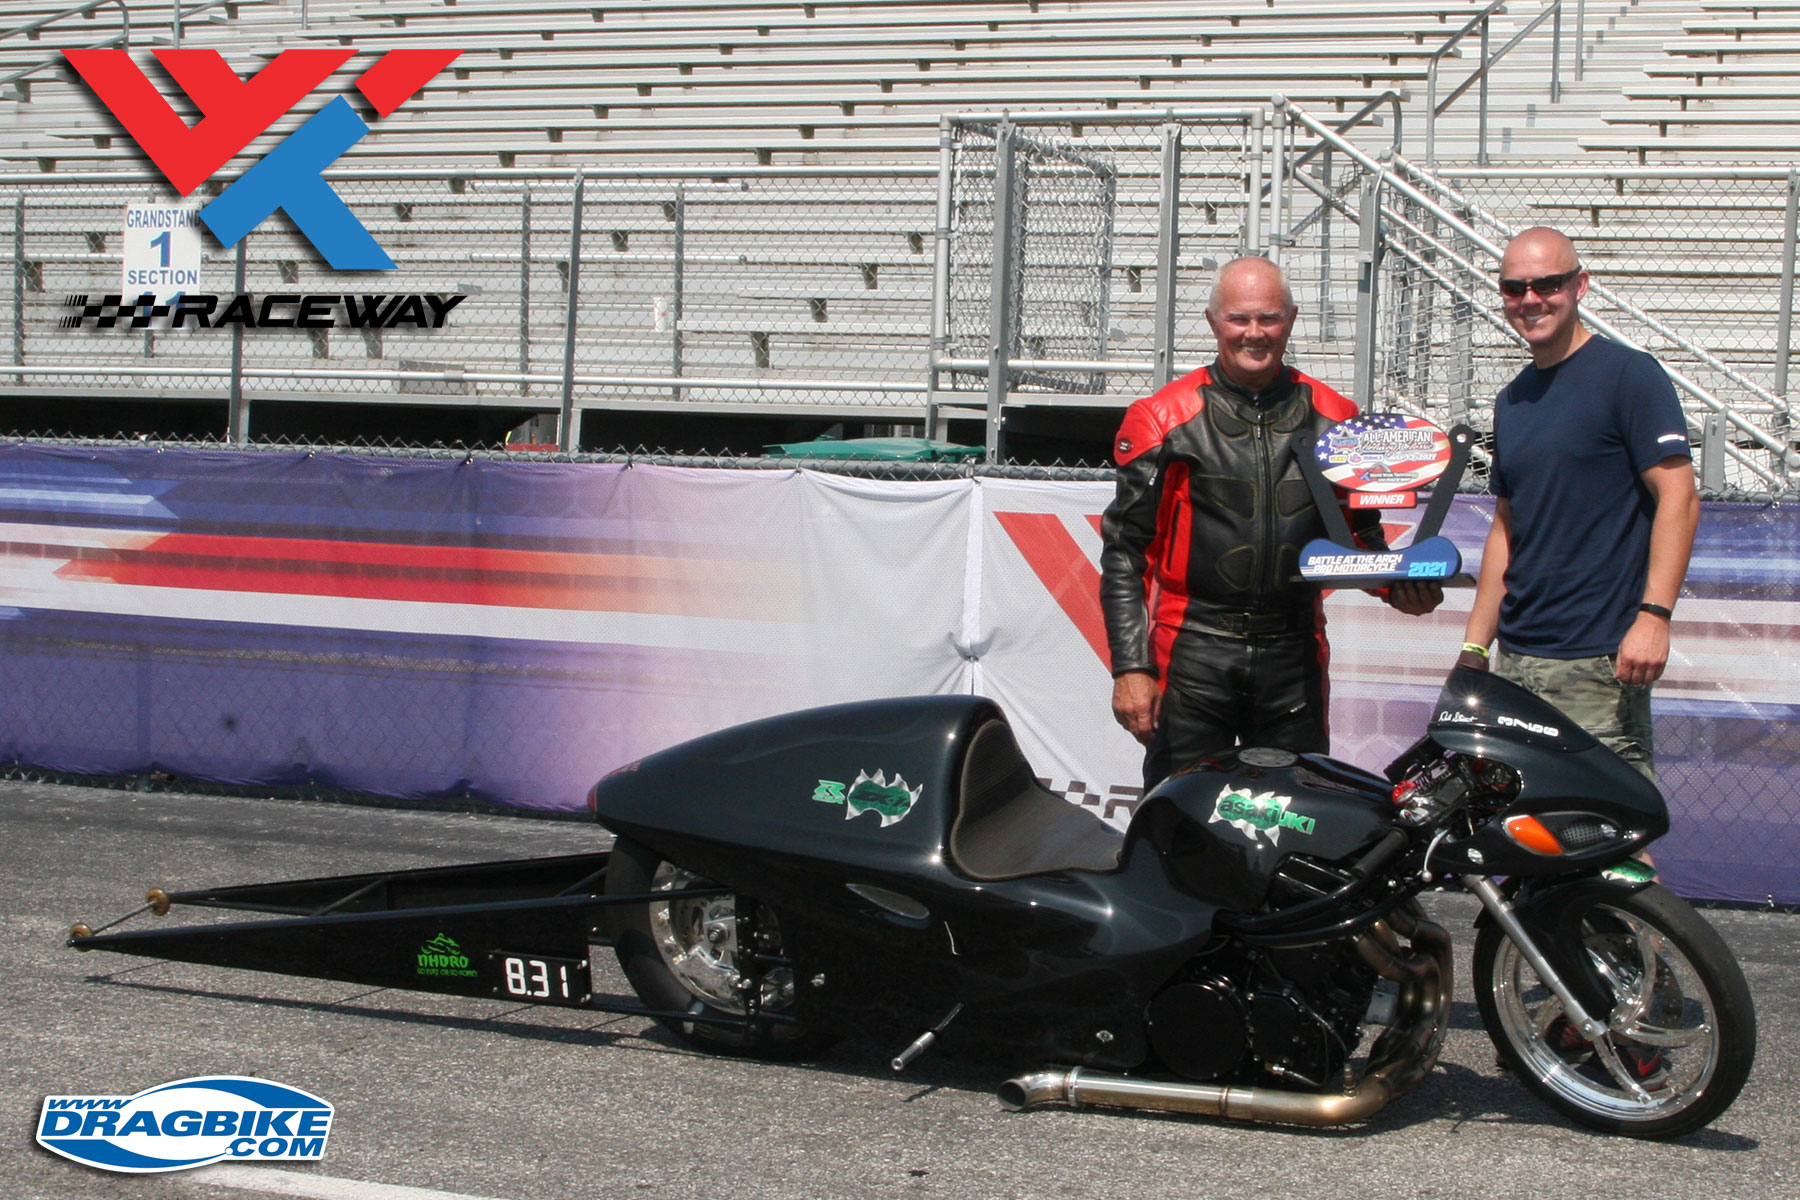 Dale Stewart - World Wide Technology Raceway at Gateway